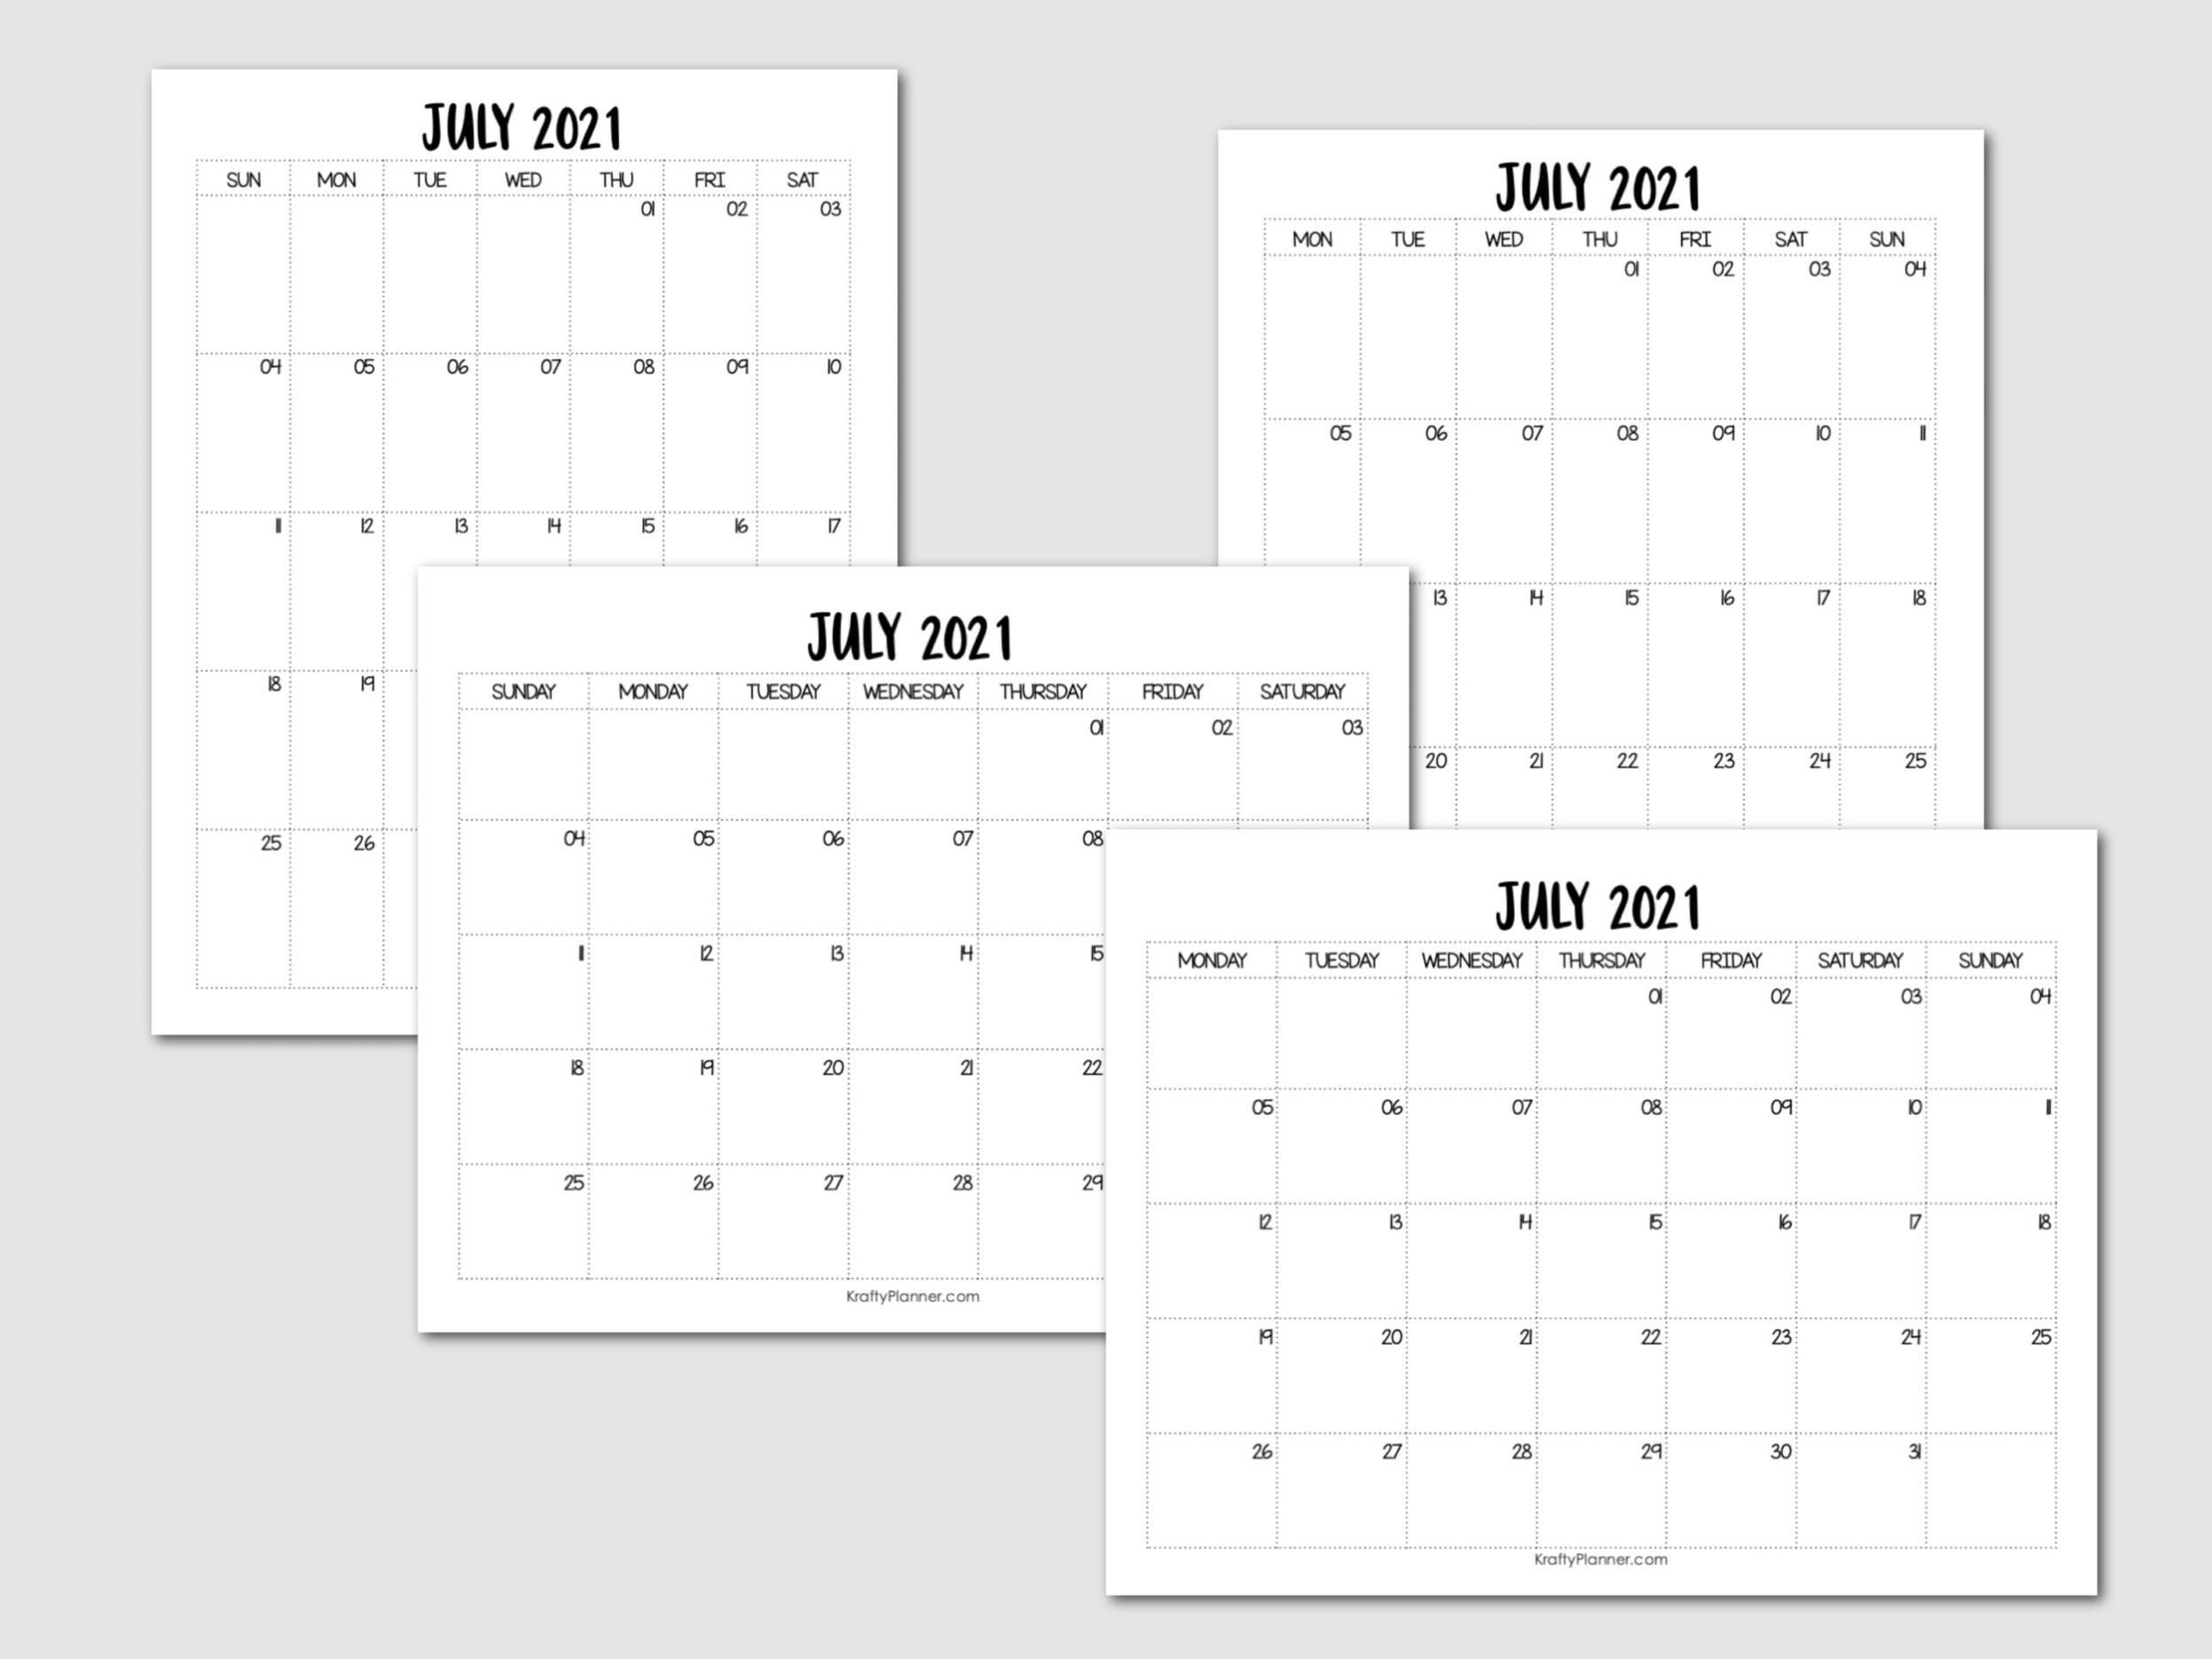 Free Printable July 2021 Calendar Main Image .png